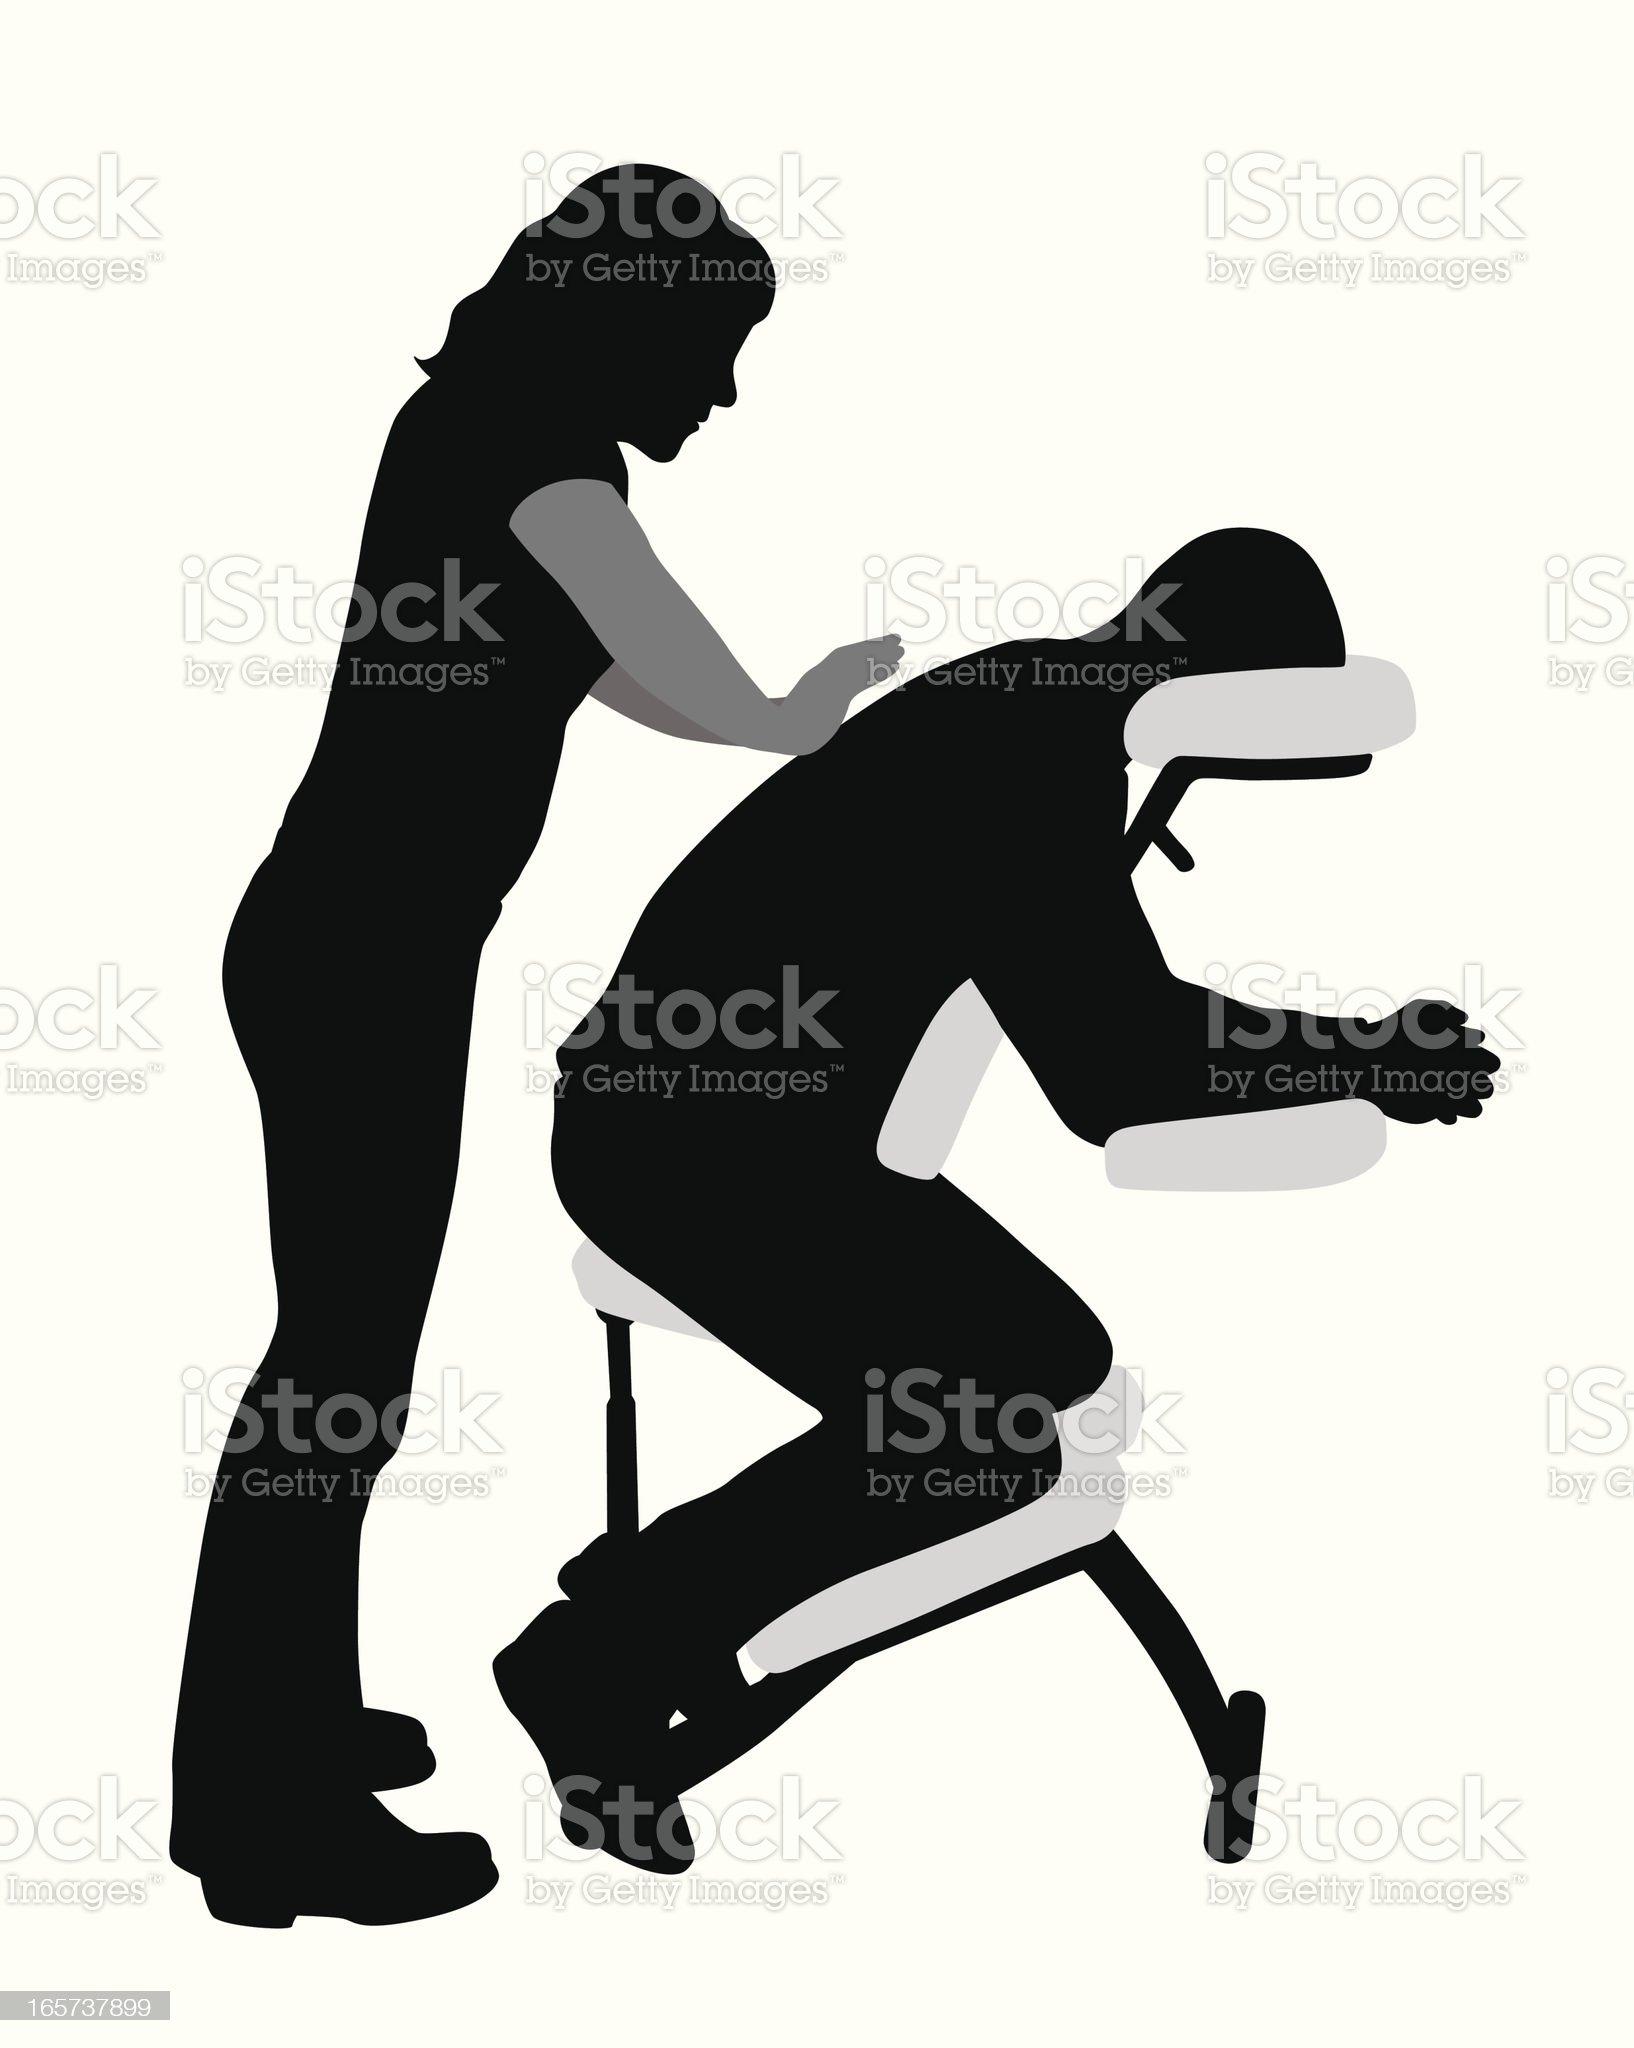 Massage Therapist Vector Silhouette royalty-free stock vector art